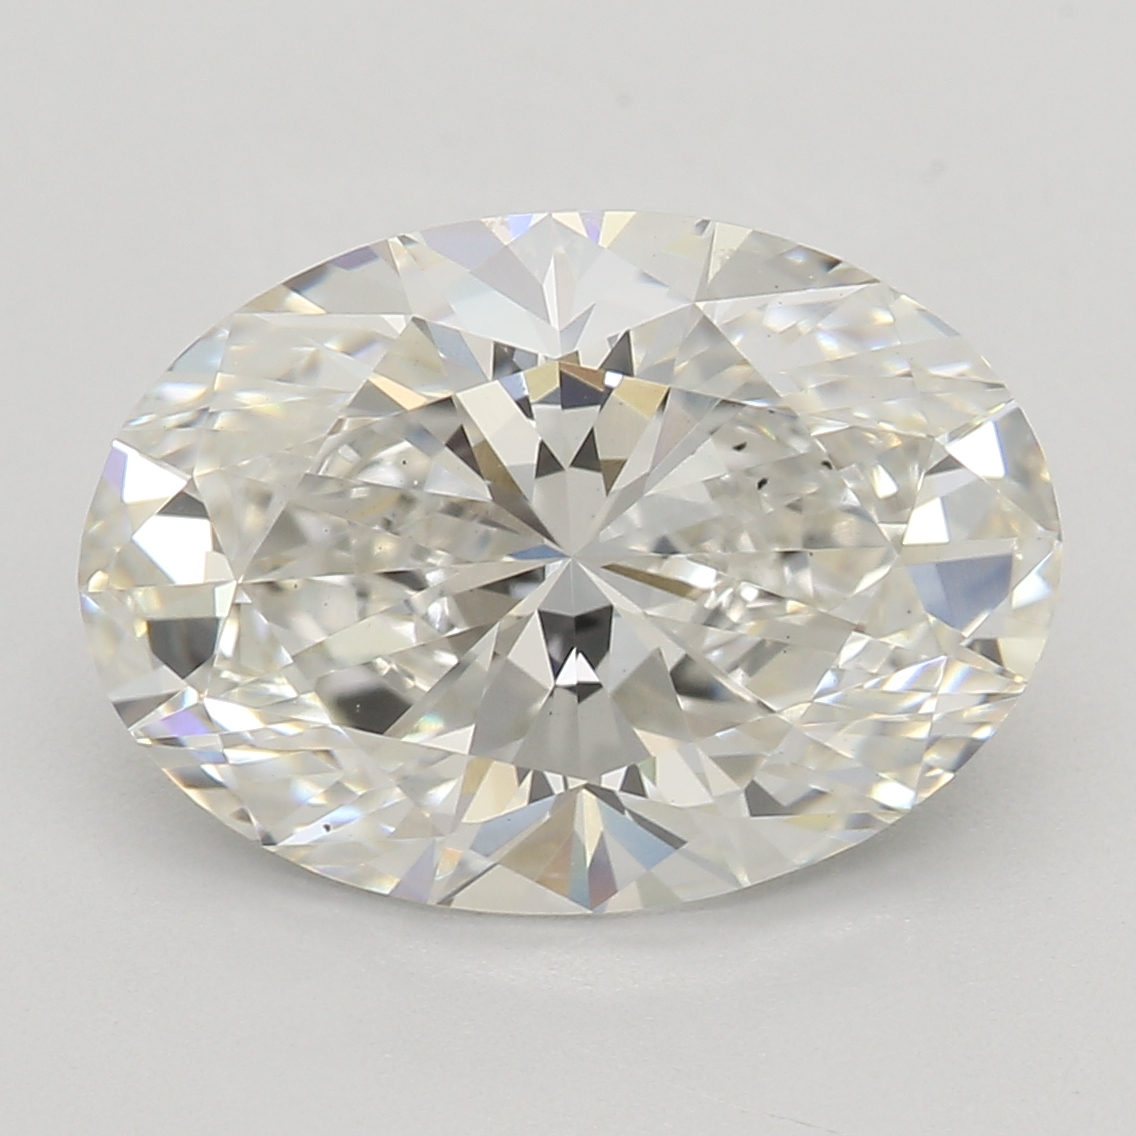 2.57 Carat I-VS2 Excellent Oval Diamond